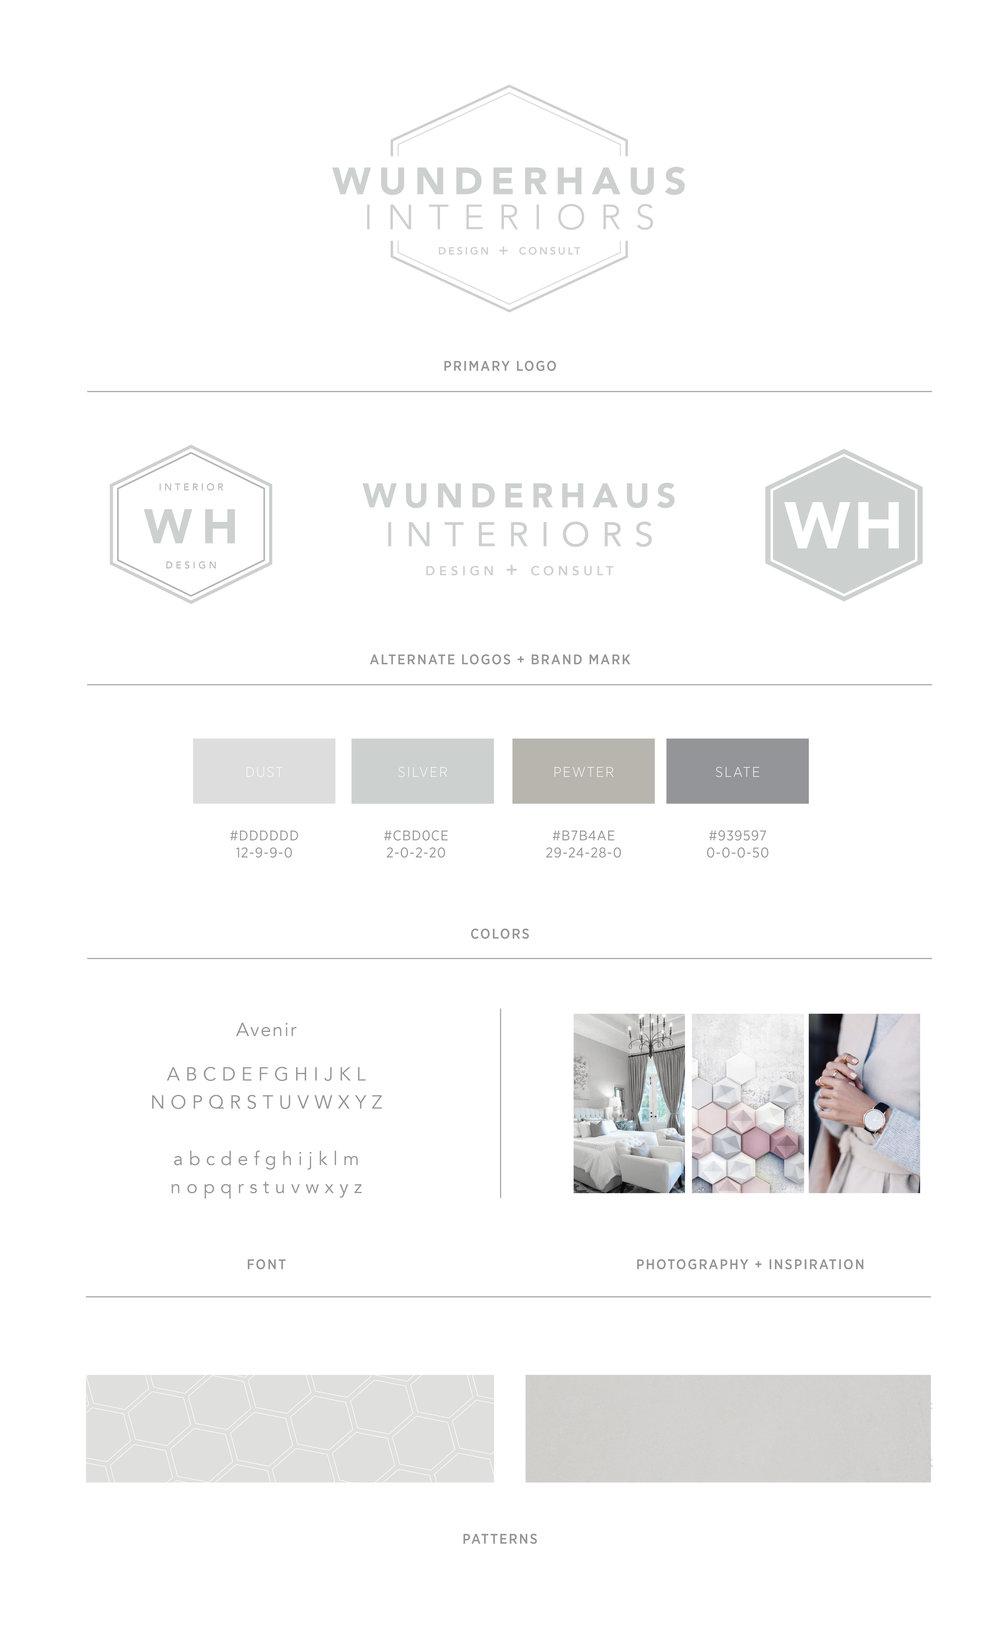 Branding design for Wunderhaus Interiors | casilong.com #casilongdesign #fearlesspursuit #branding #branddesign